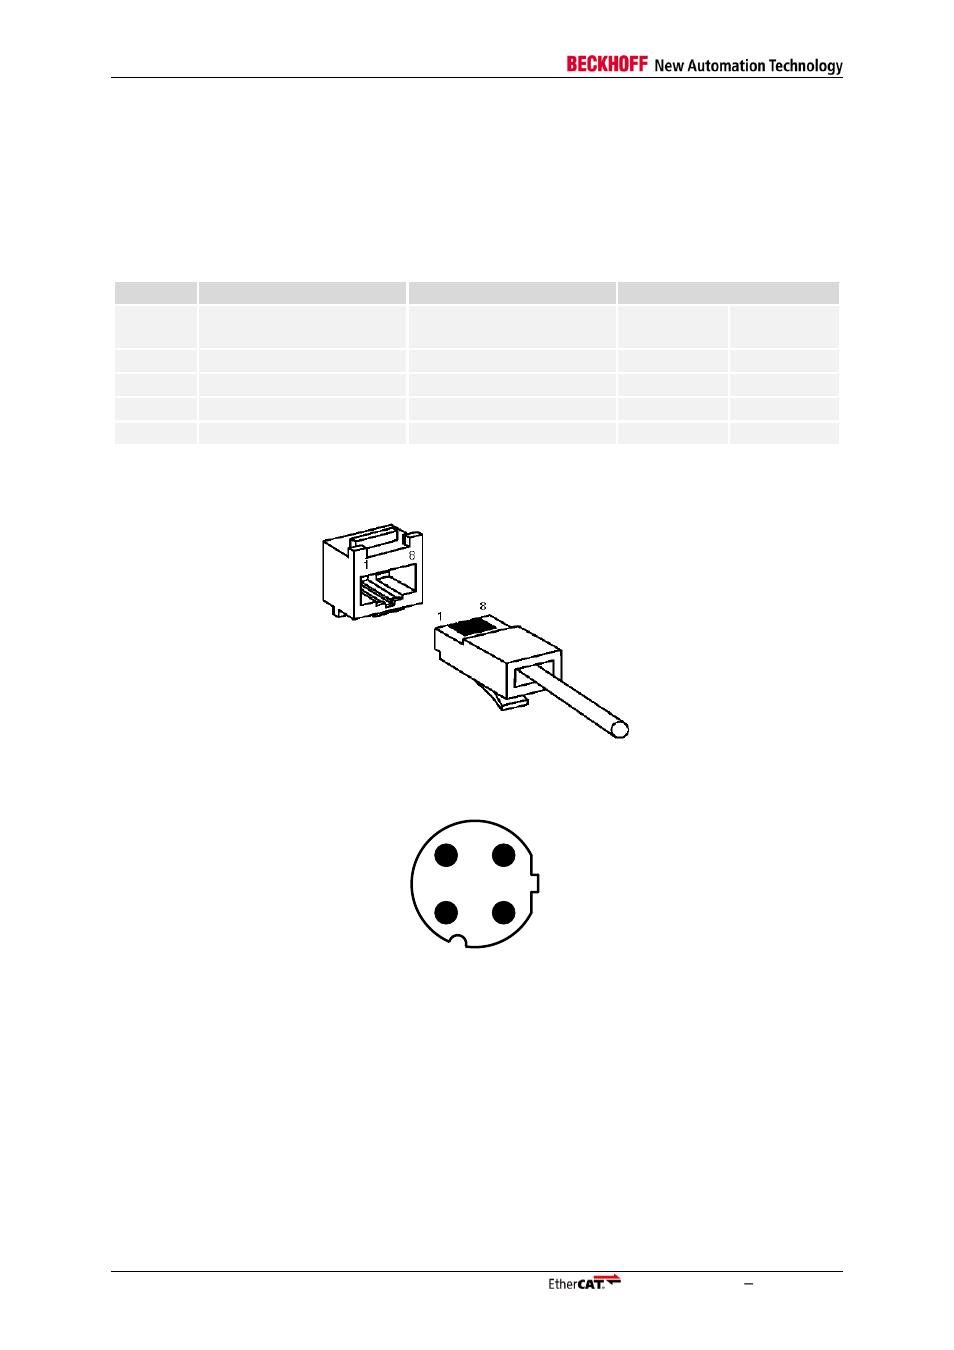 13 ethernet connector (rj45 / m12), Ethernet connector (rj45 / m12 on